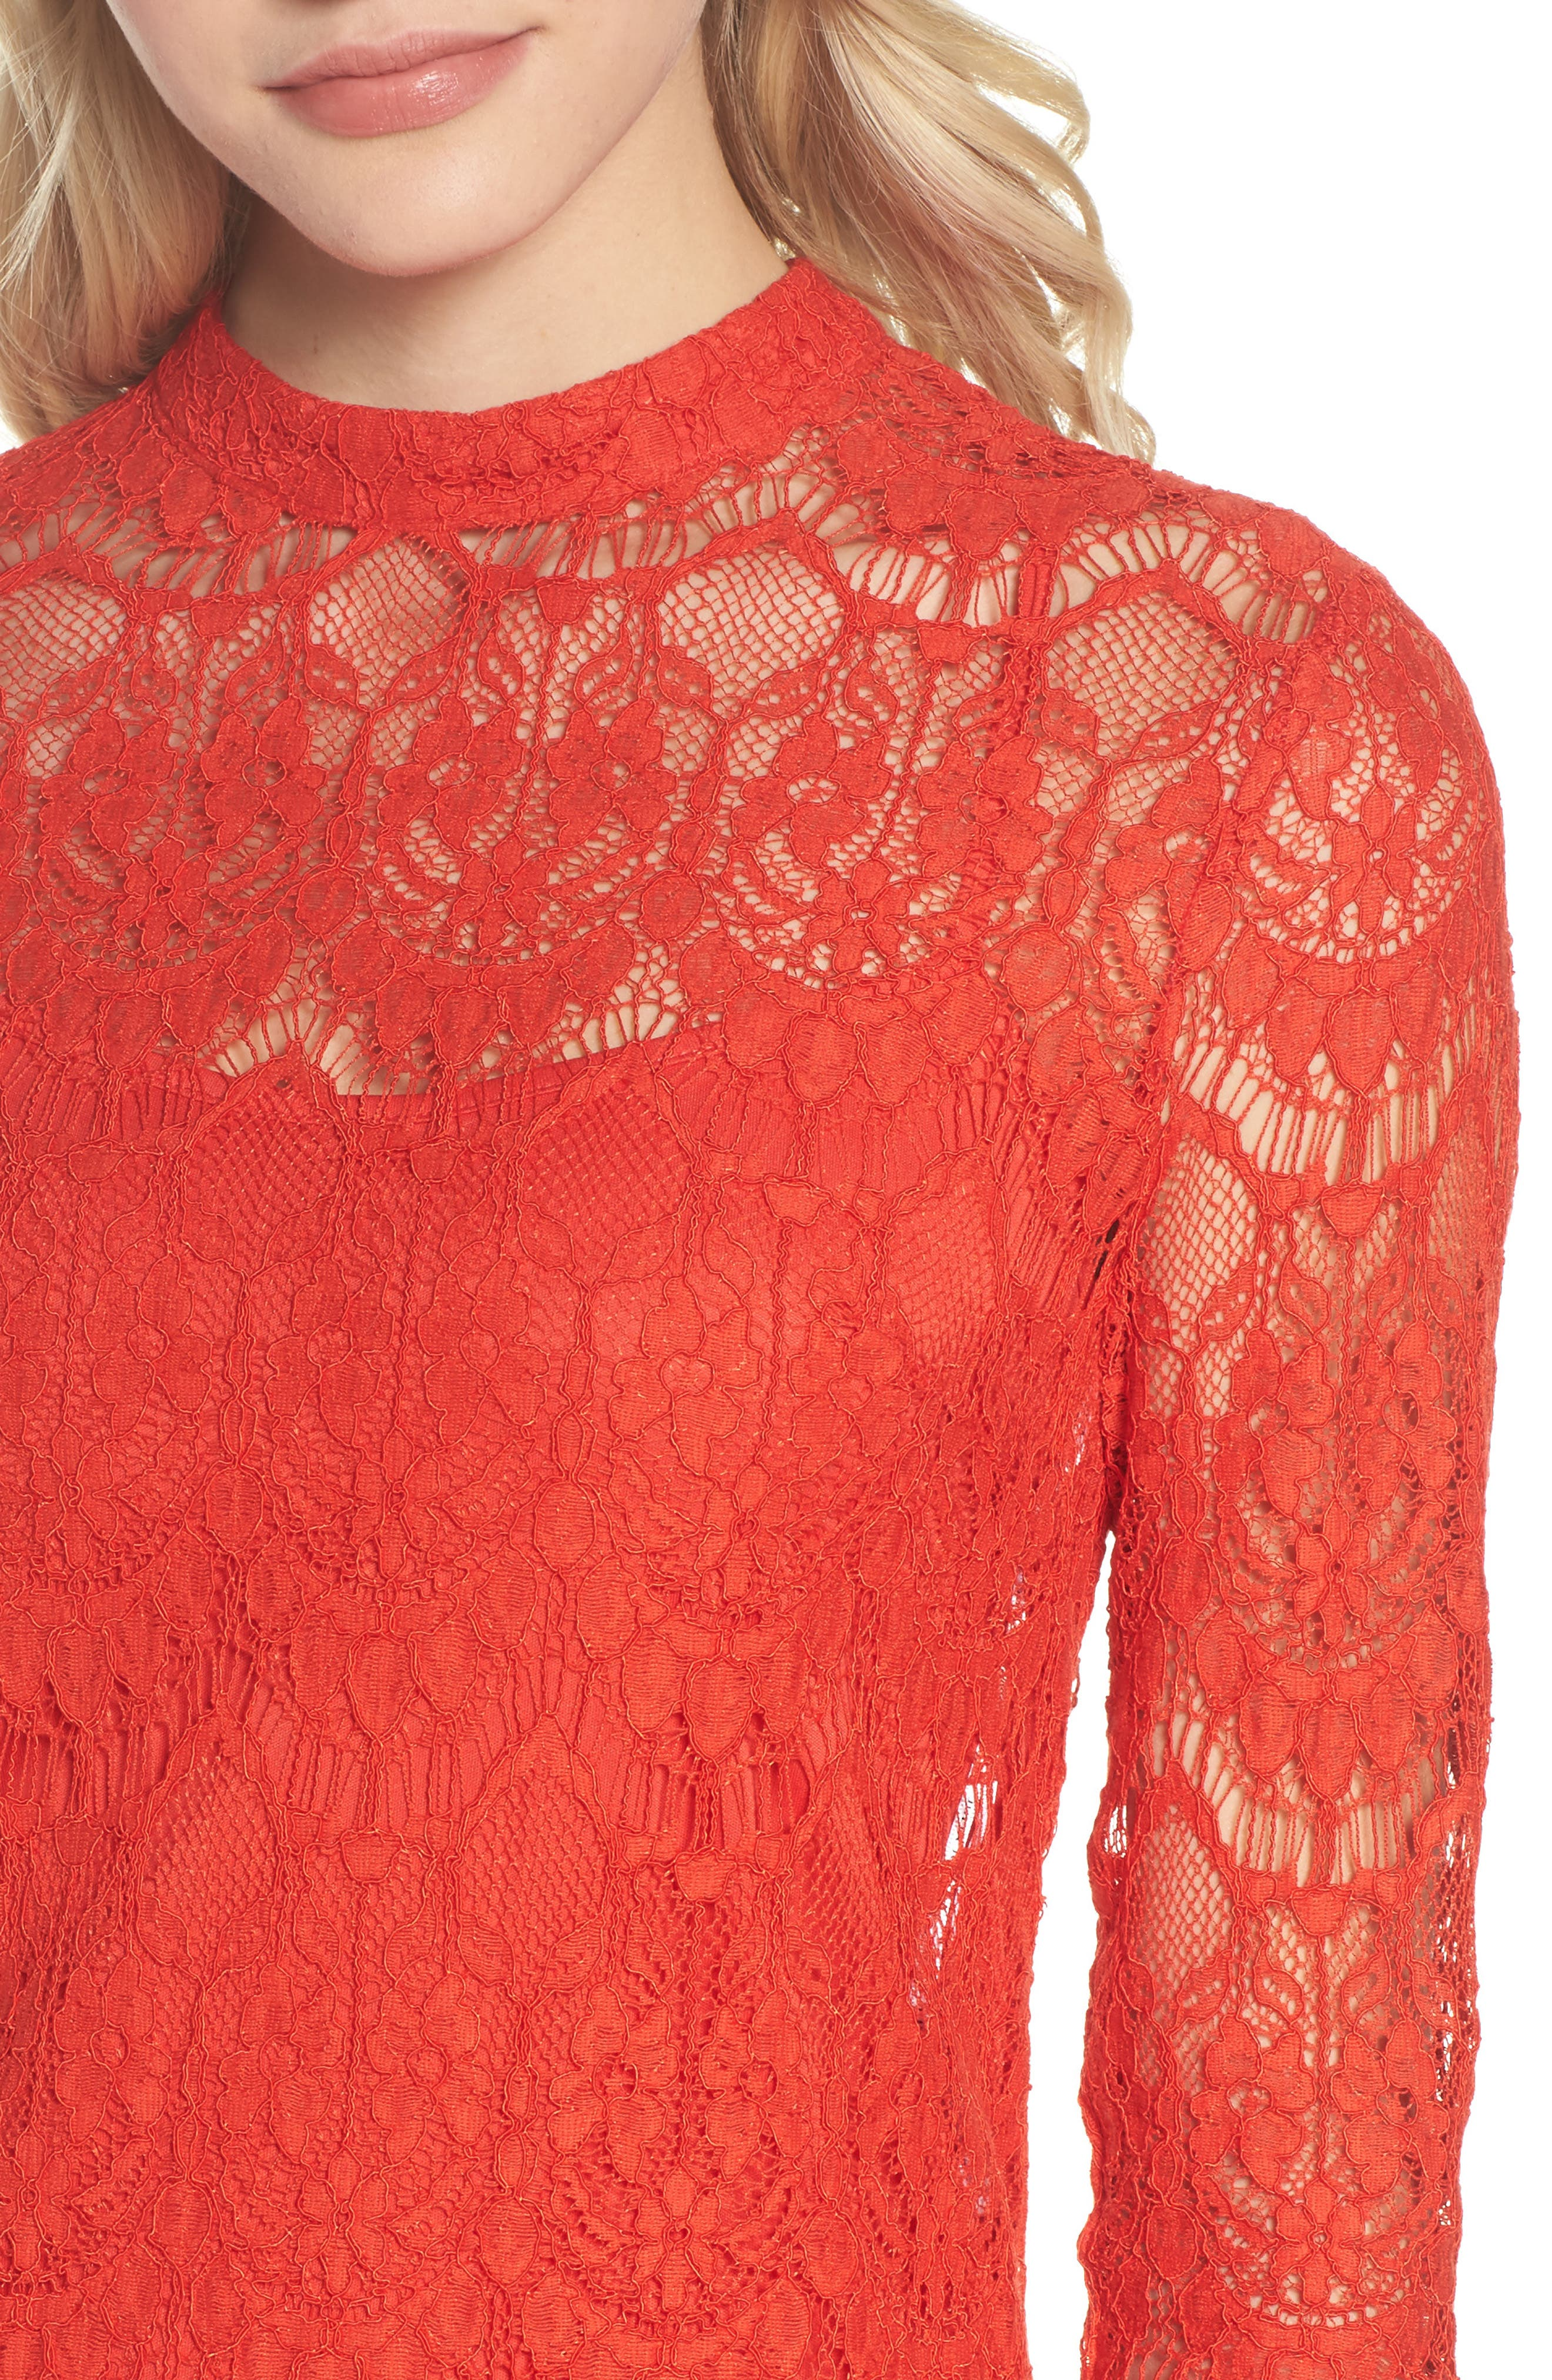 Lace Sheath Dress,                             Alternate thumbnail 4, color,                             640